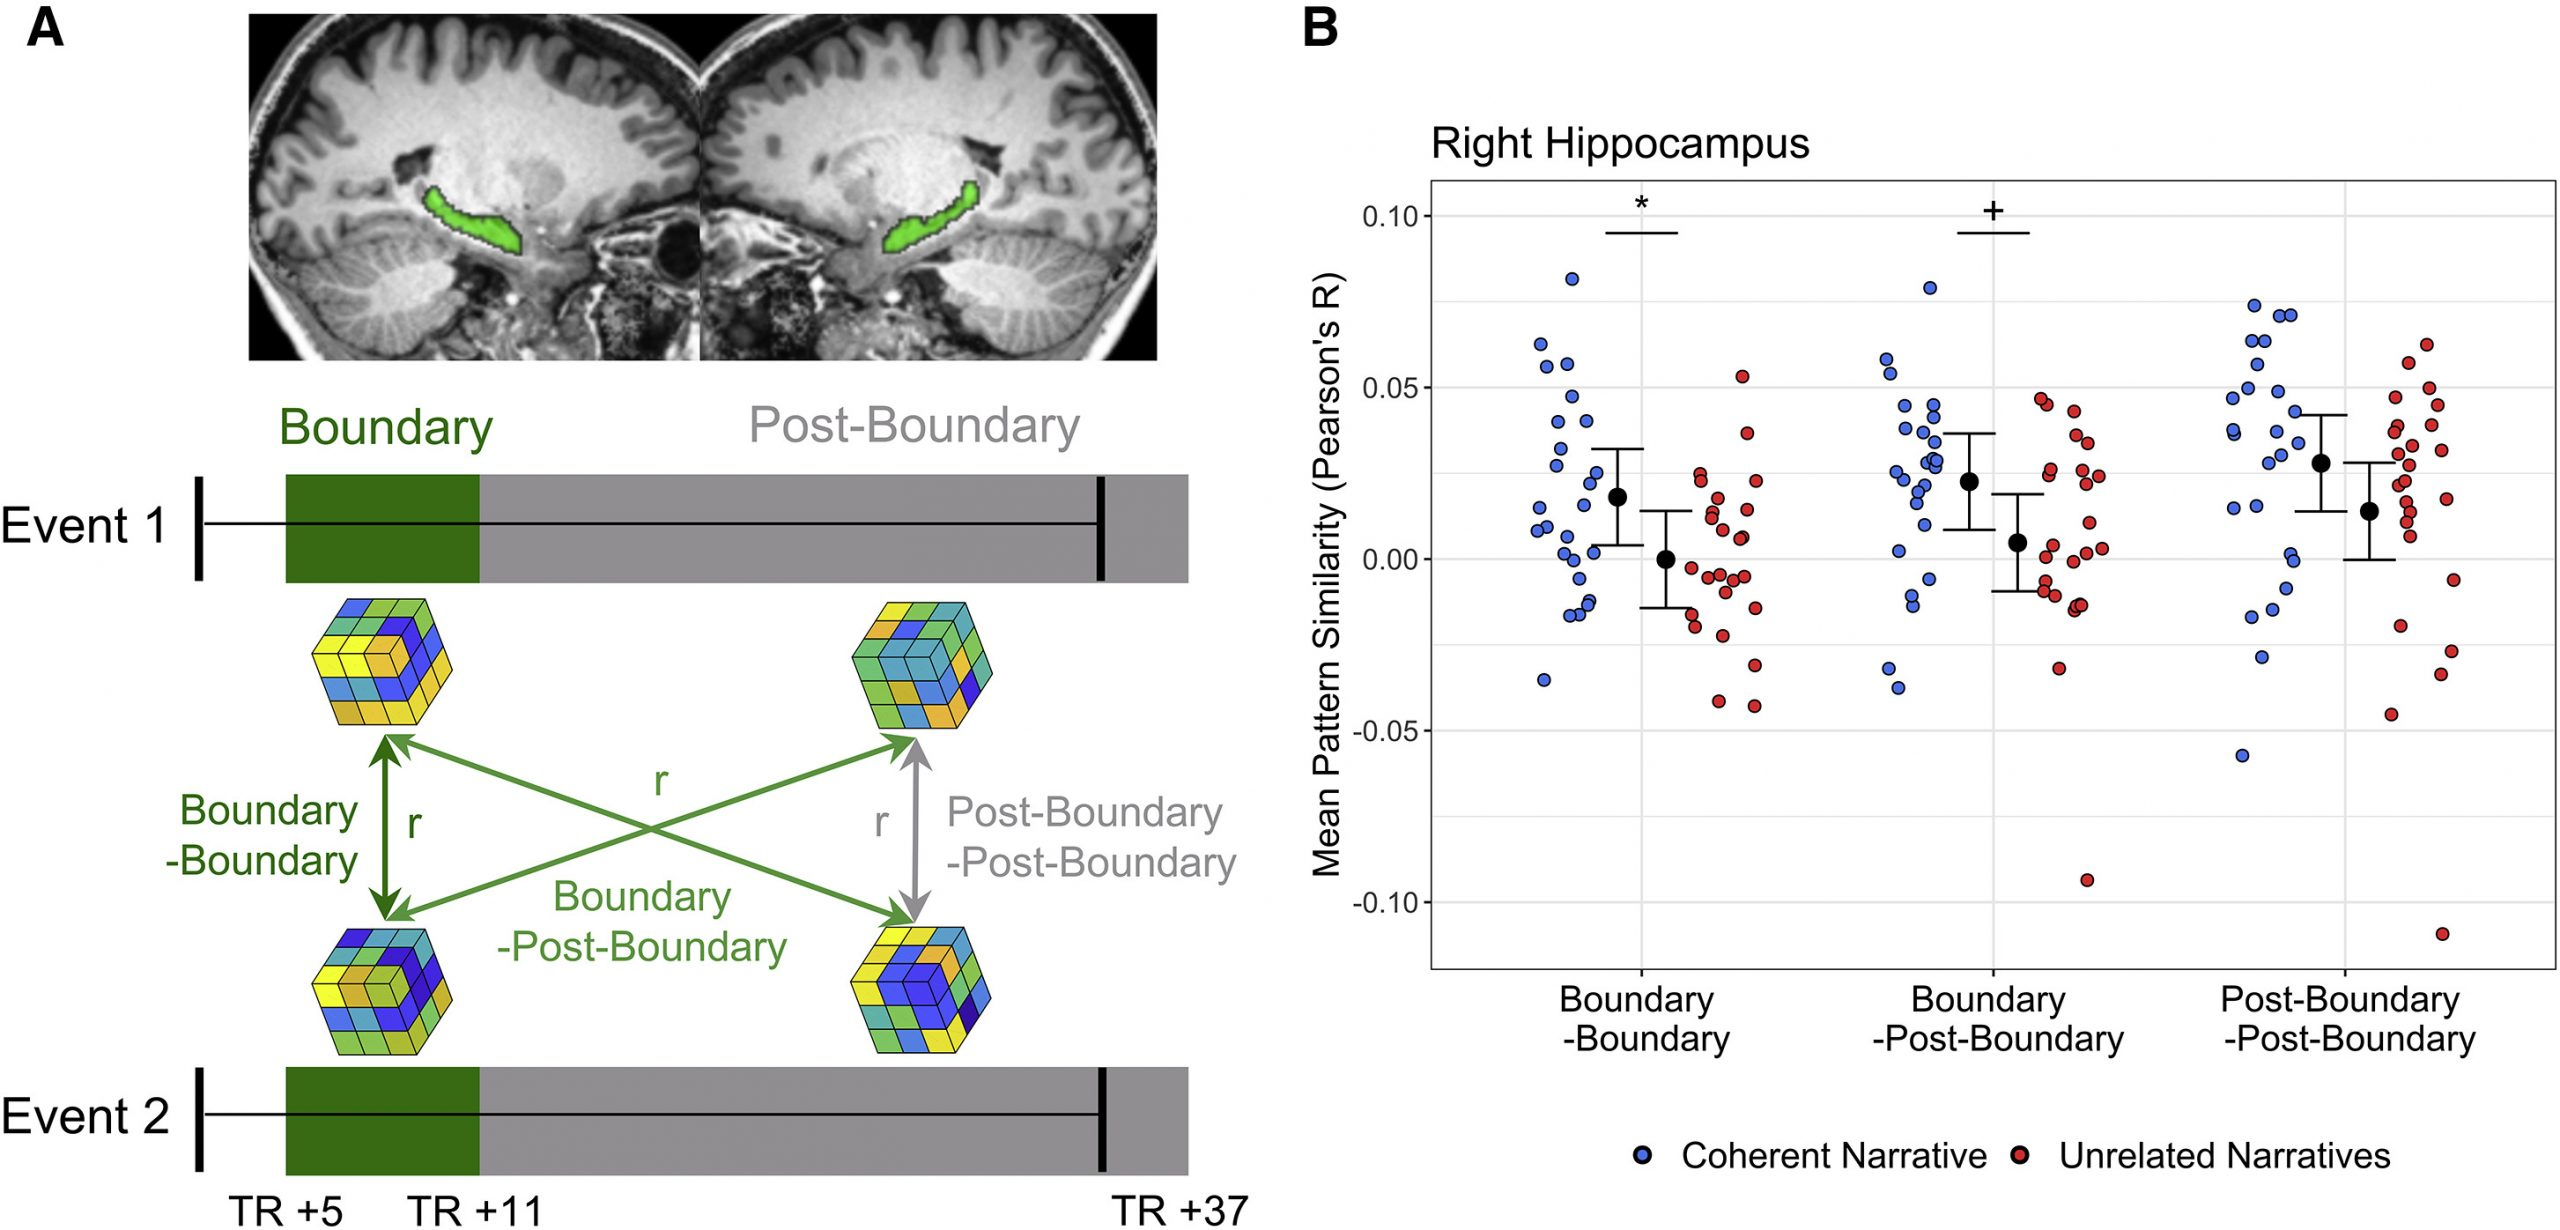 Right hippocampal activity patterns bridge events that form a coherent narrative